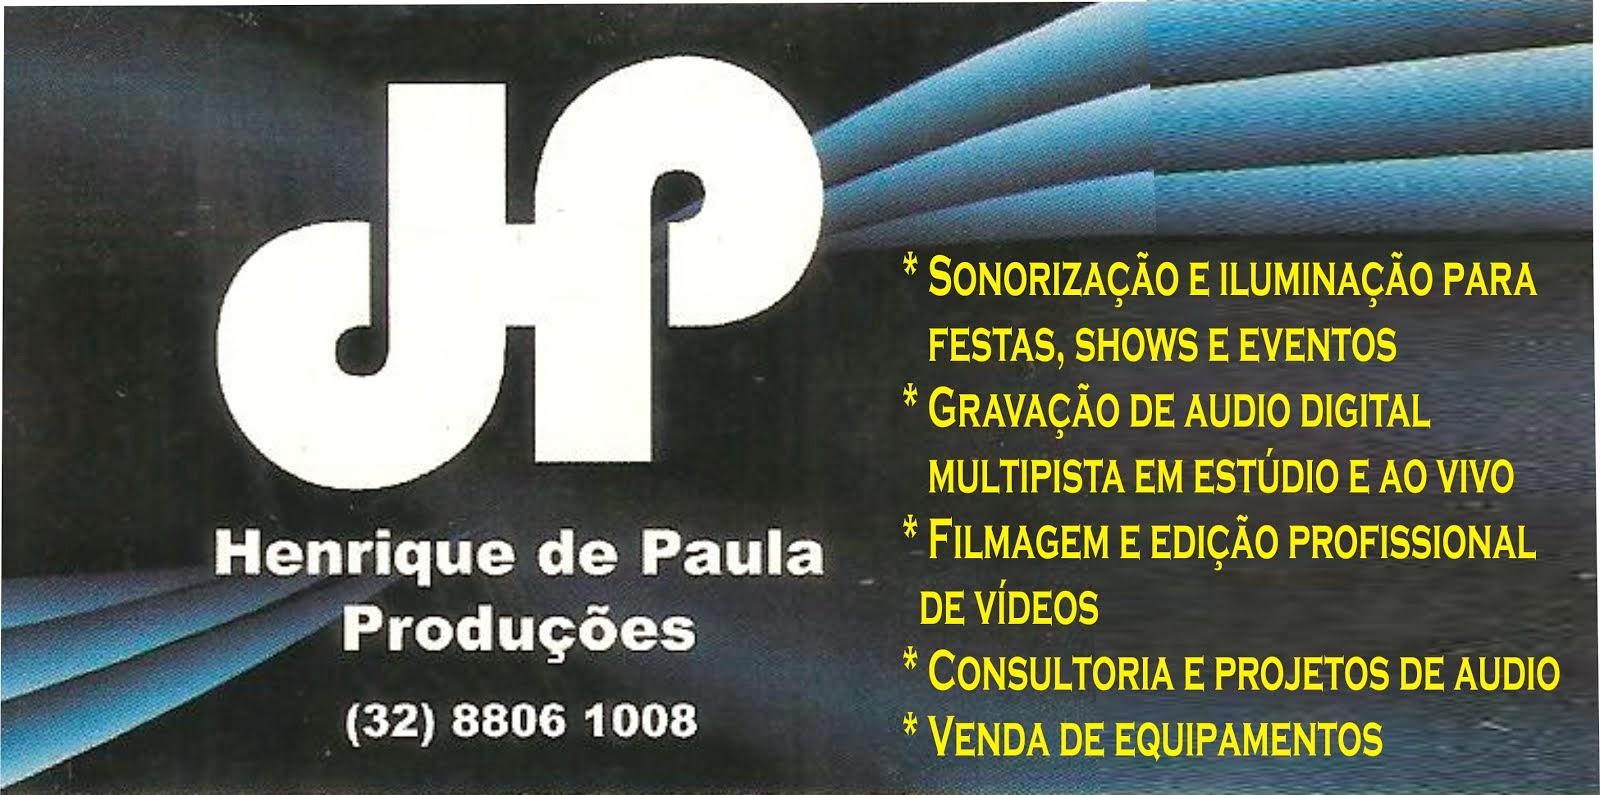 DP PRODUÇÕES